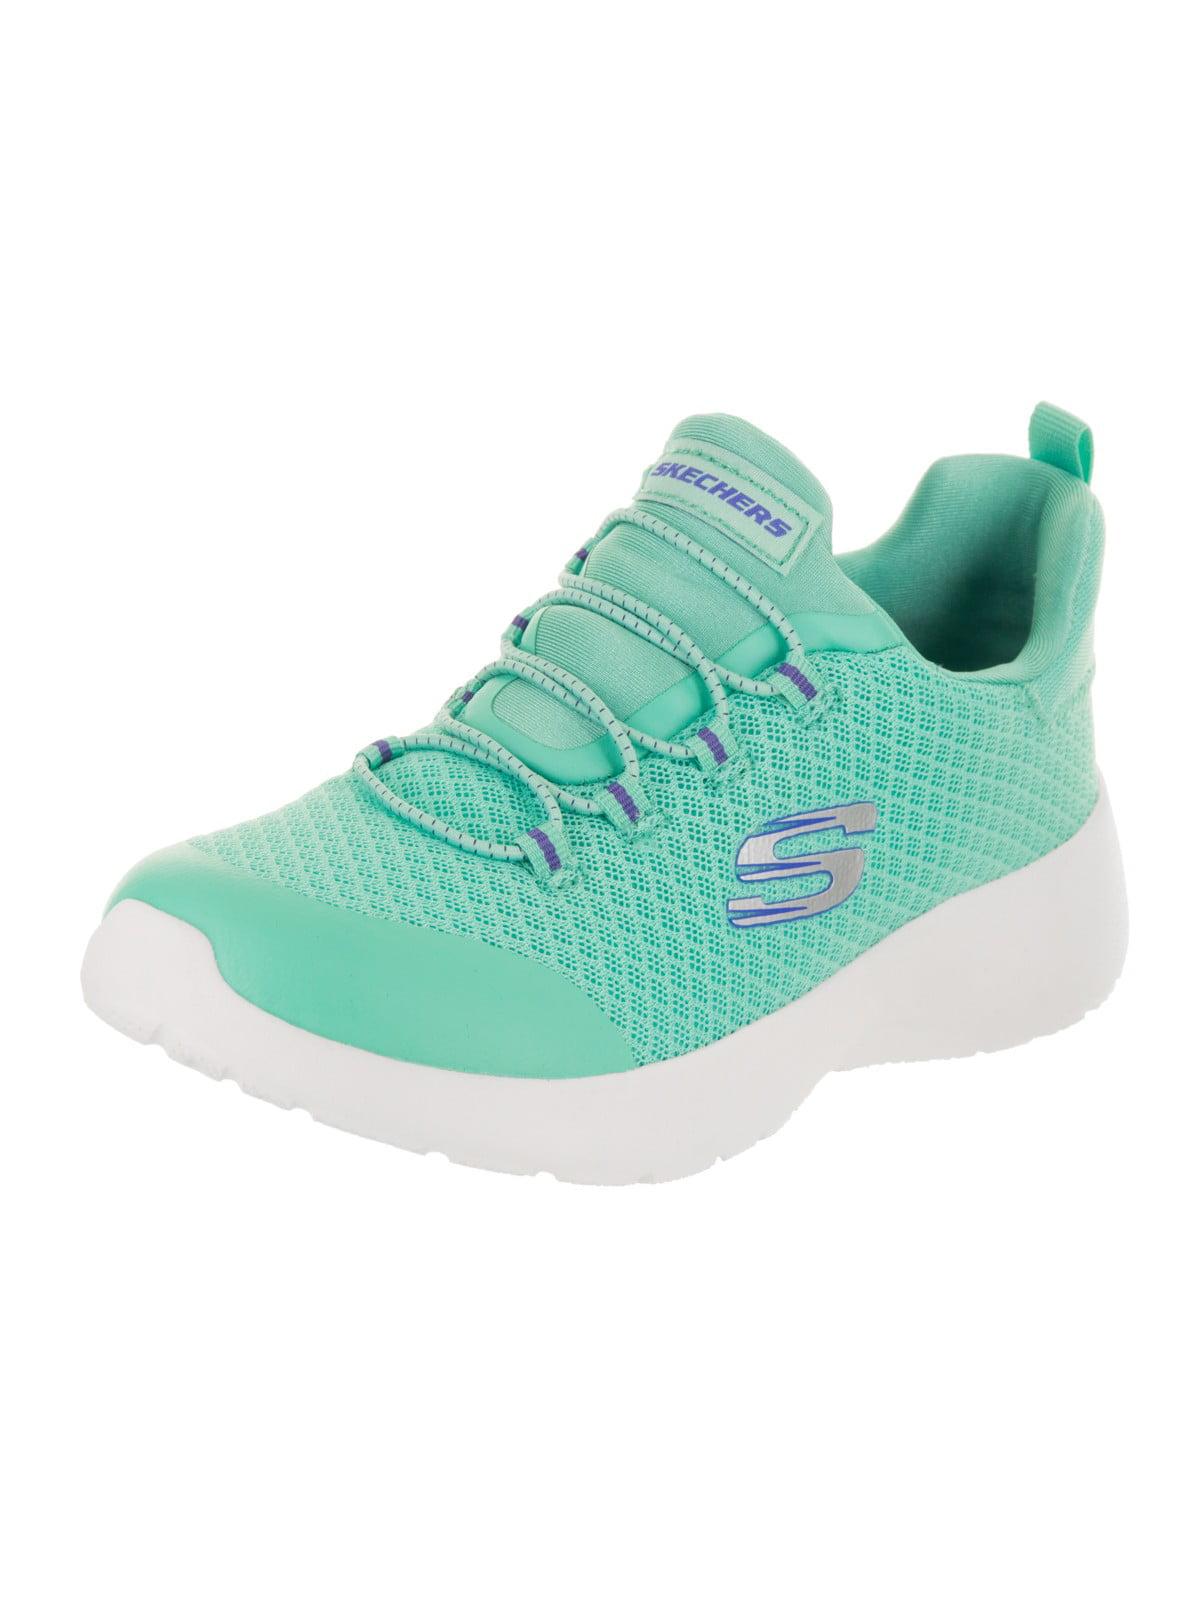 ed856adf8c2 SKECHERS - Skechers Kids Dynamight - Race N  Run Casual Shoe ...